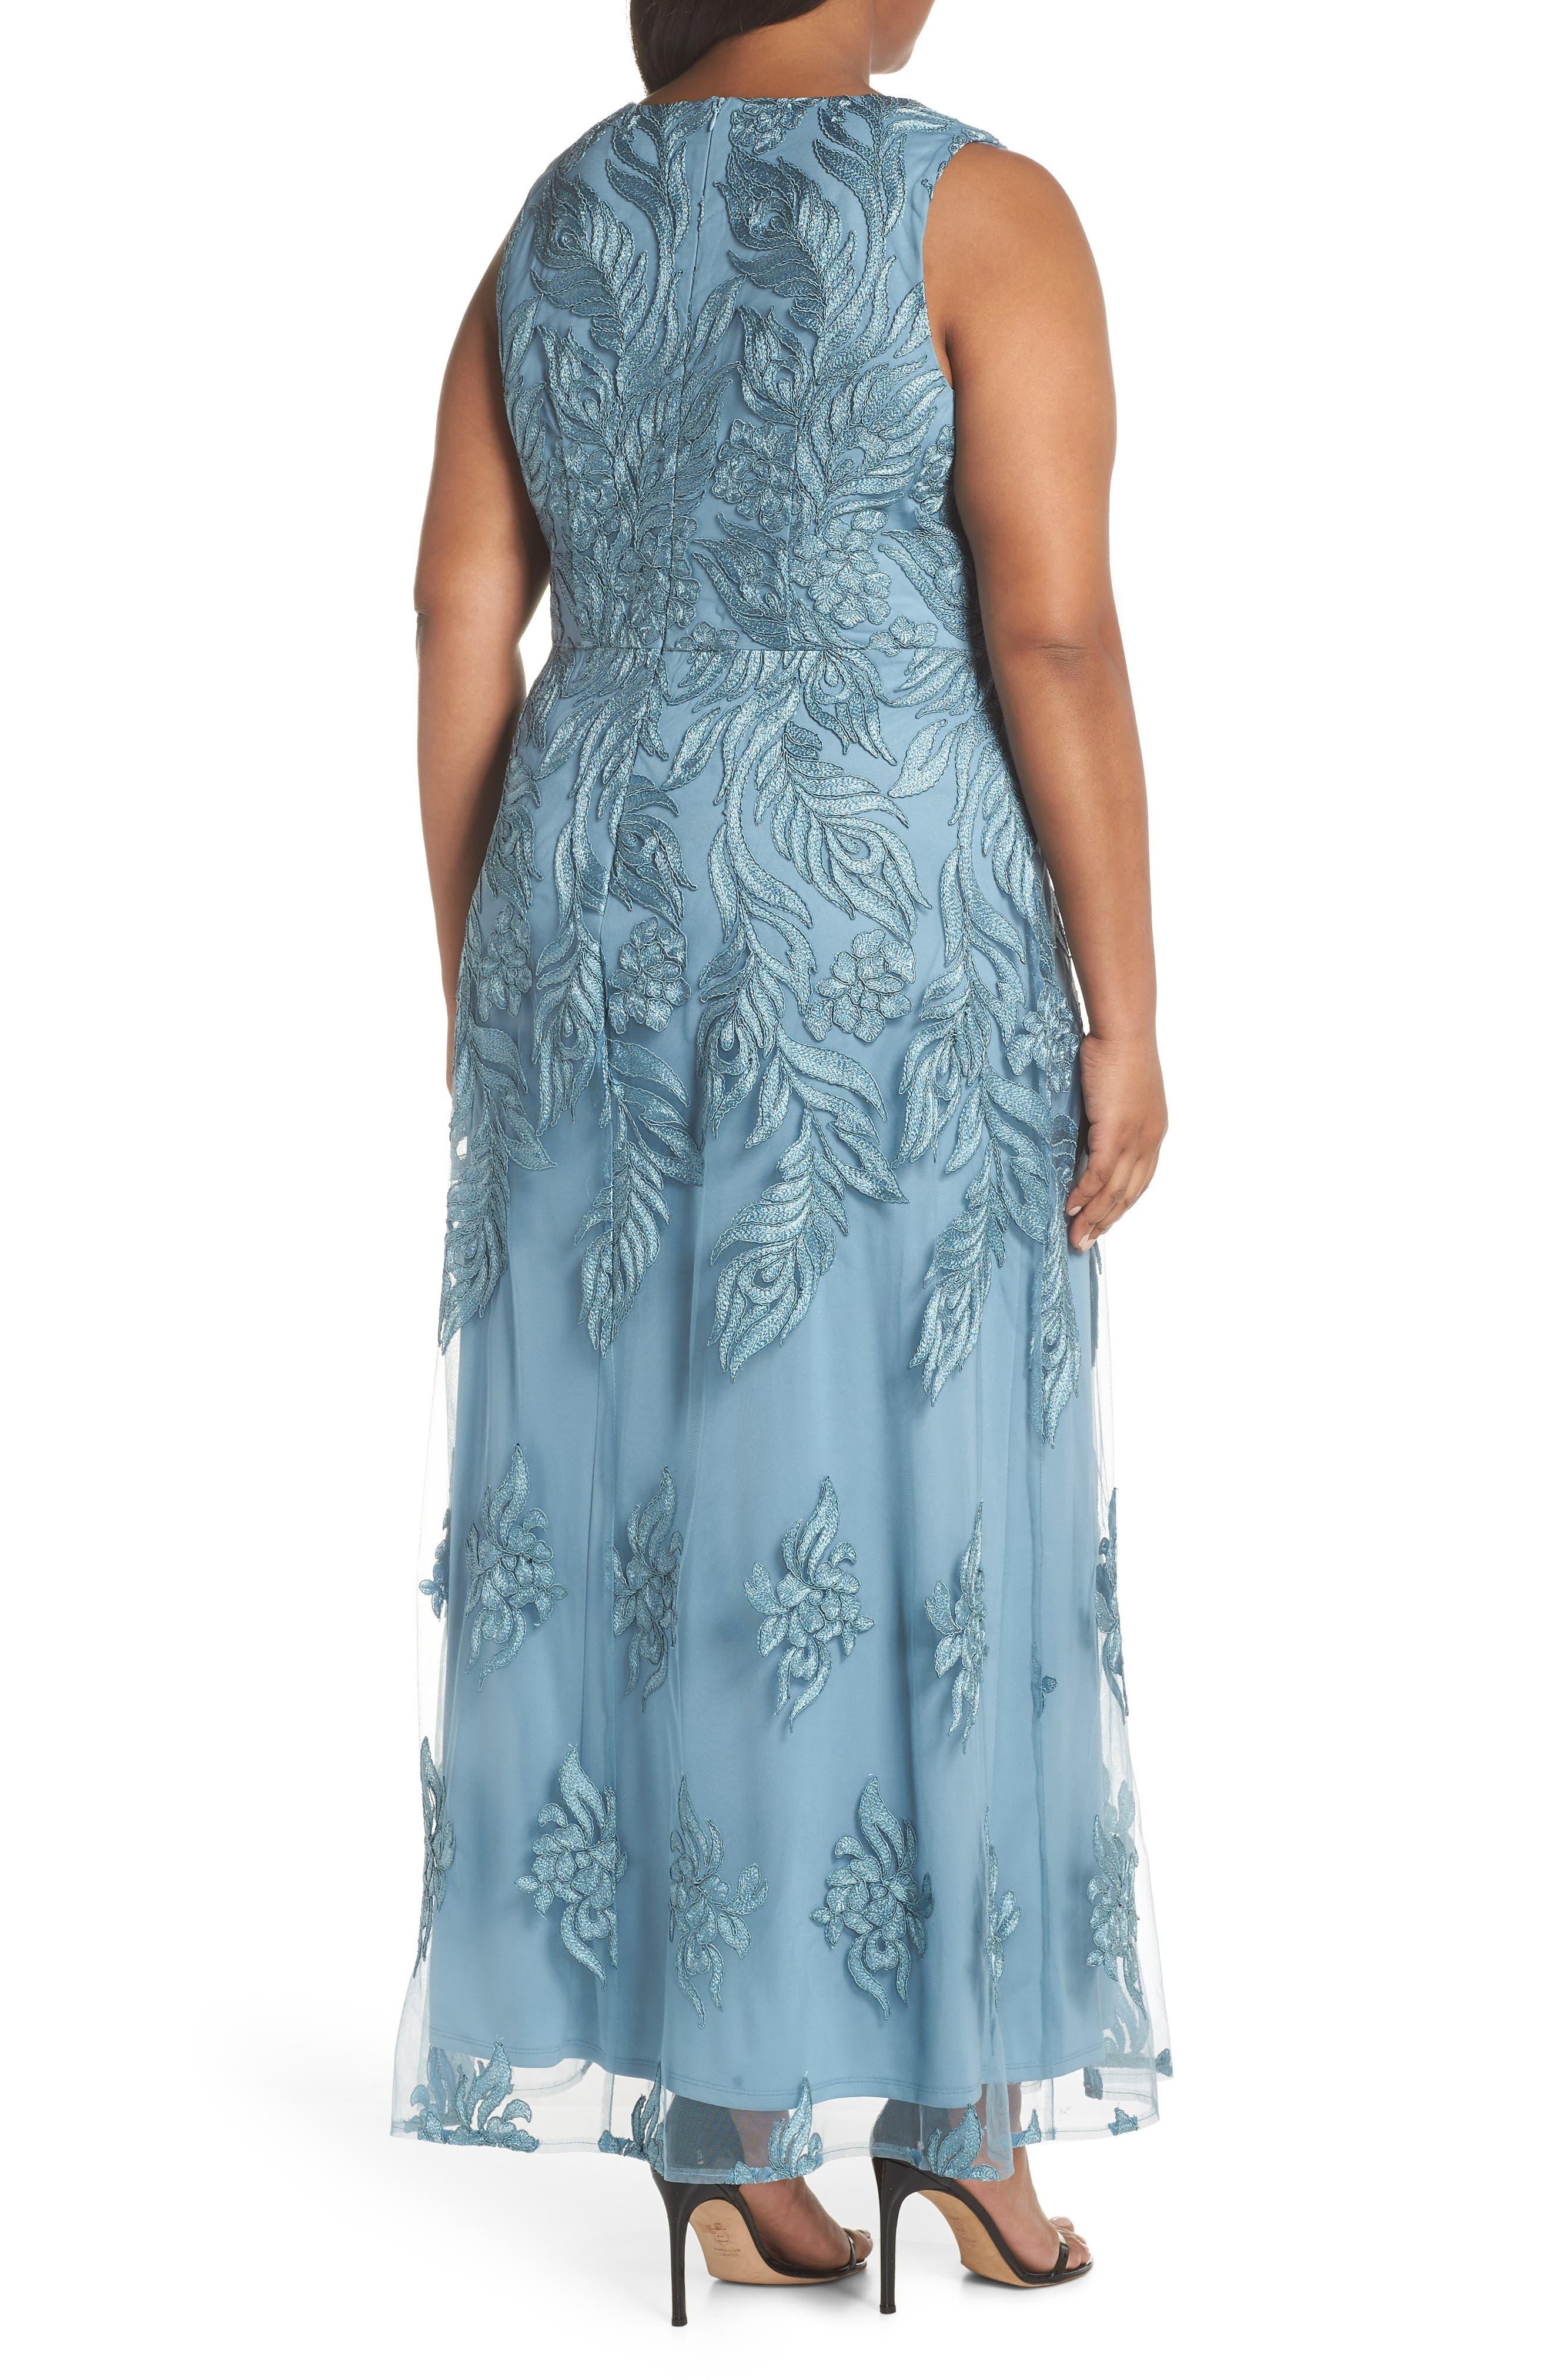 BRIANNA Dresses All Women | Nordstrom